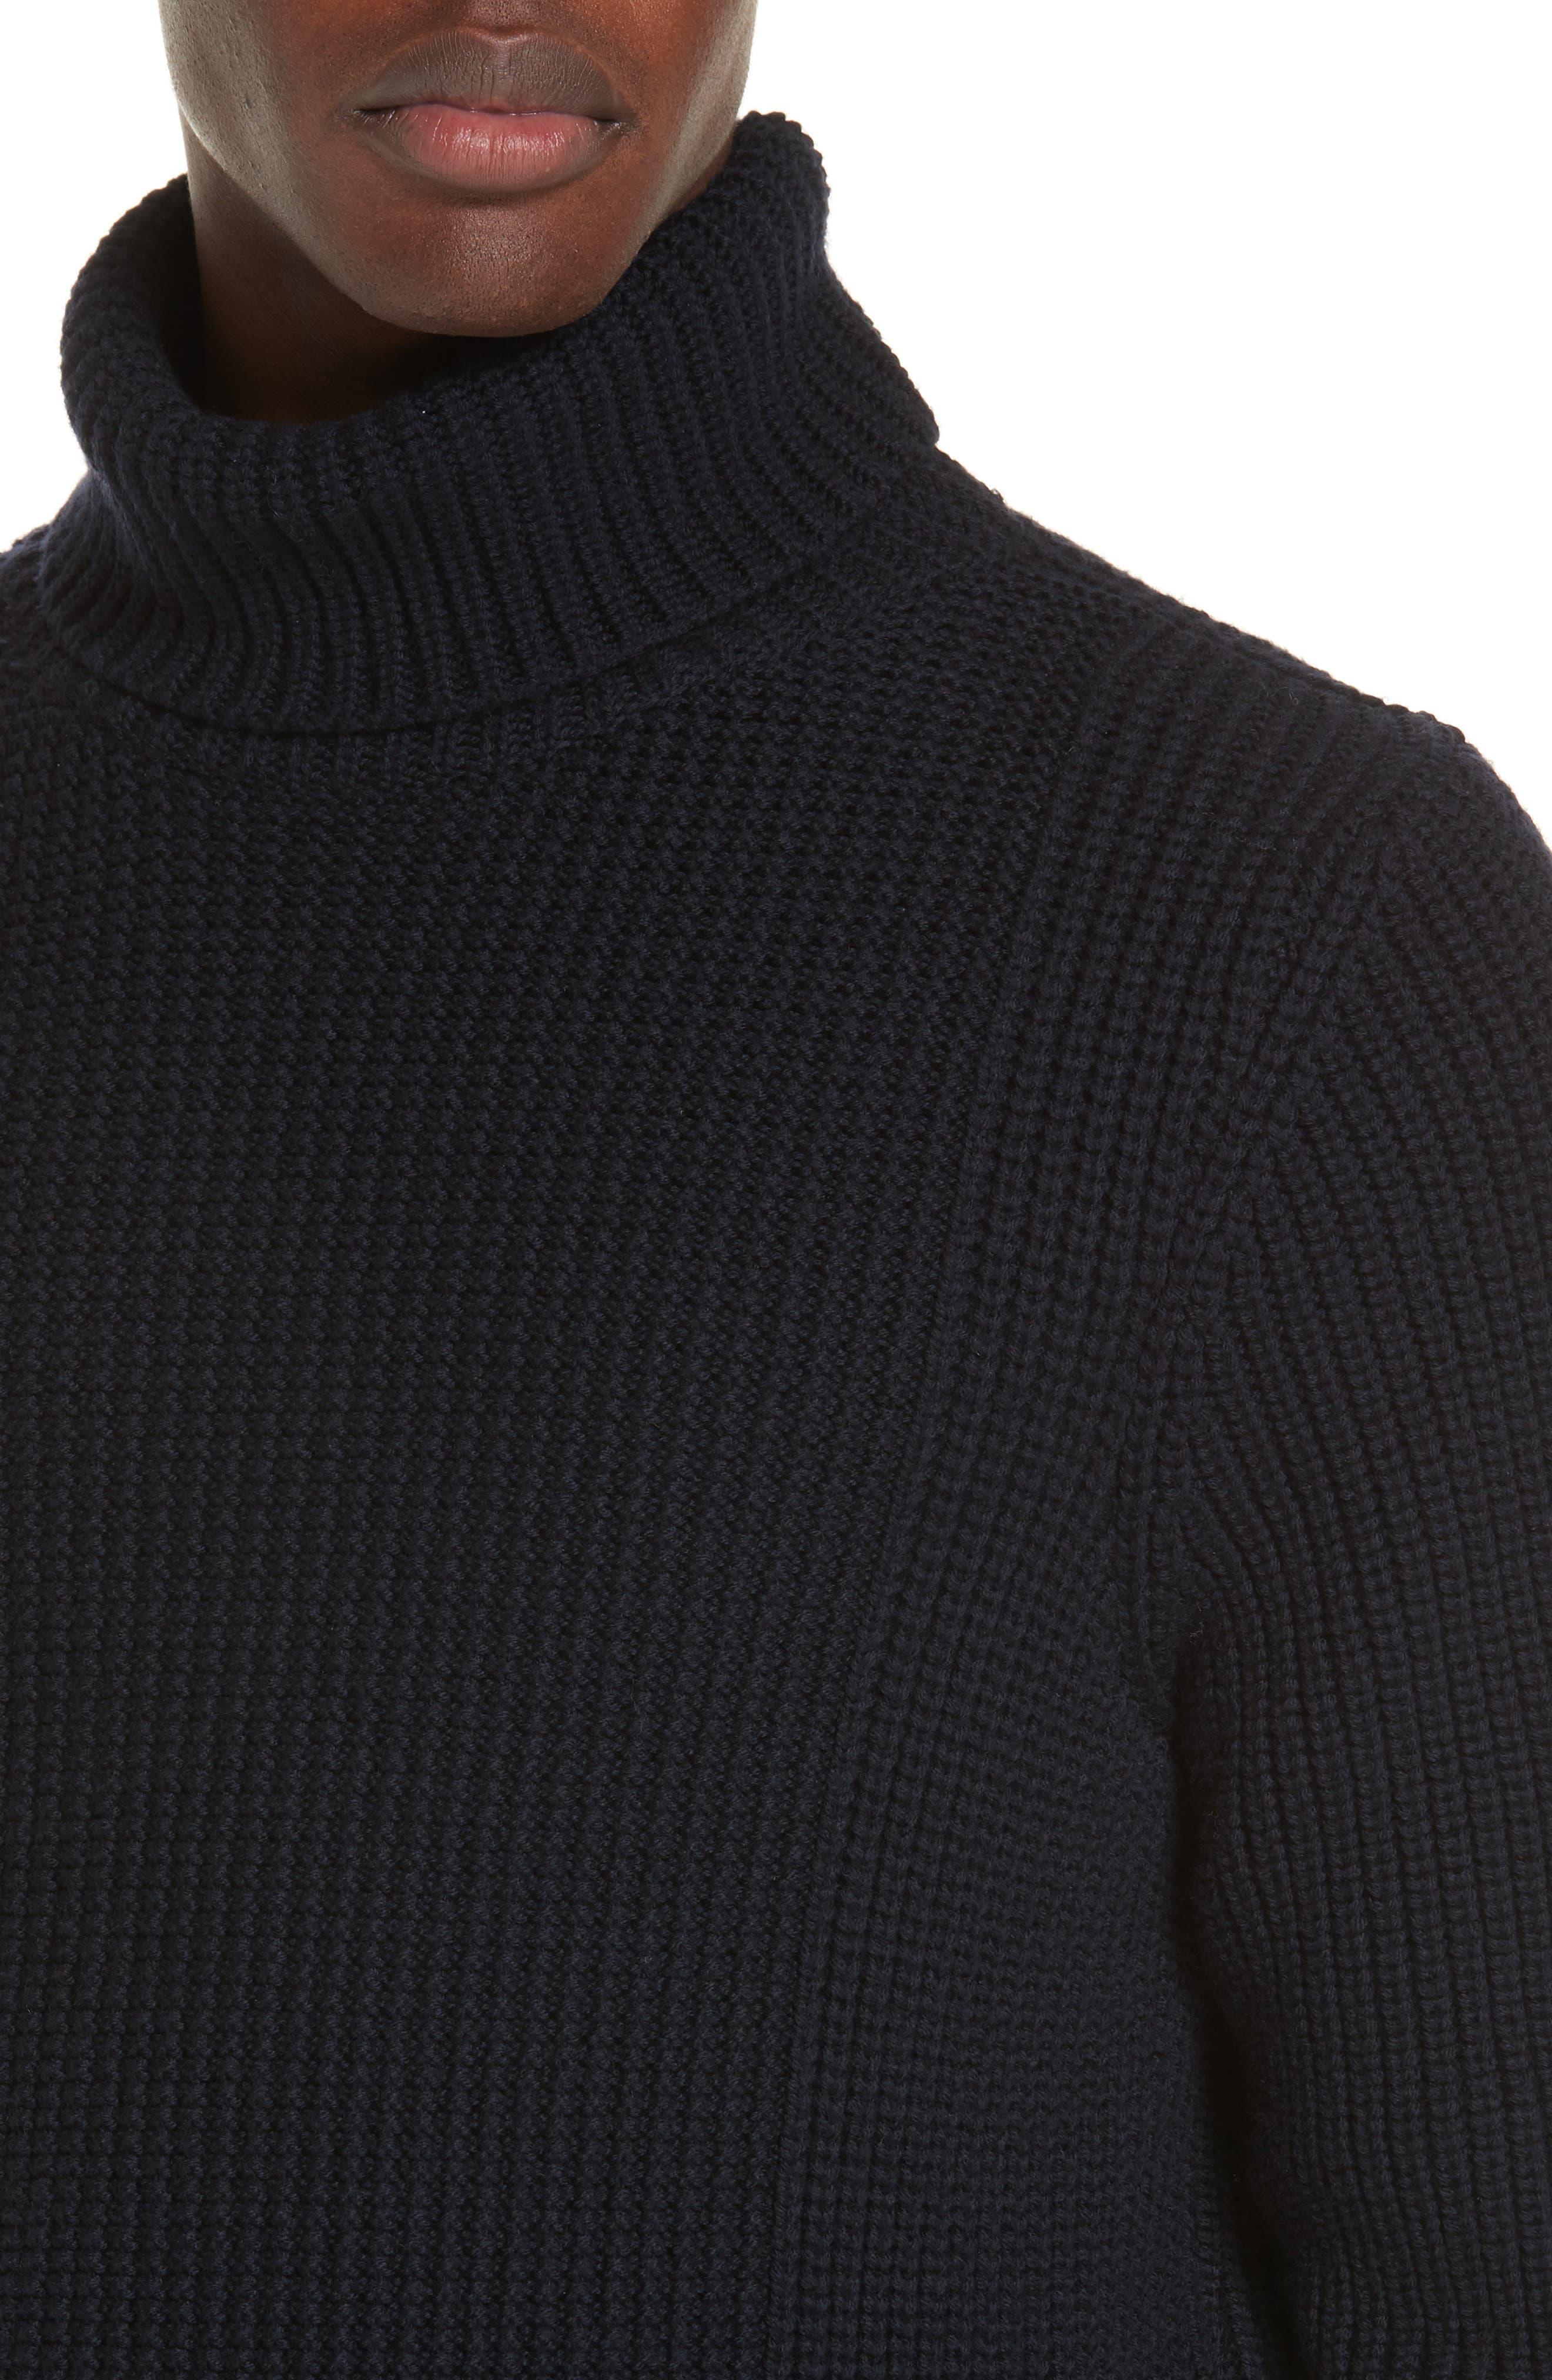 Ribbed Merino Wool Turtleneck Sweater,                             Alternate thumbnail 4, color,                             NAVY